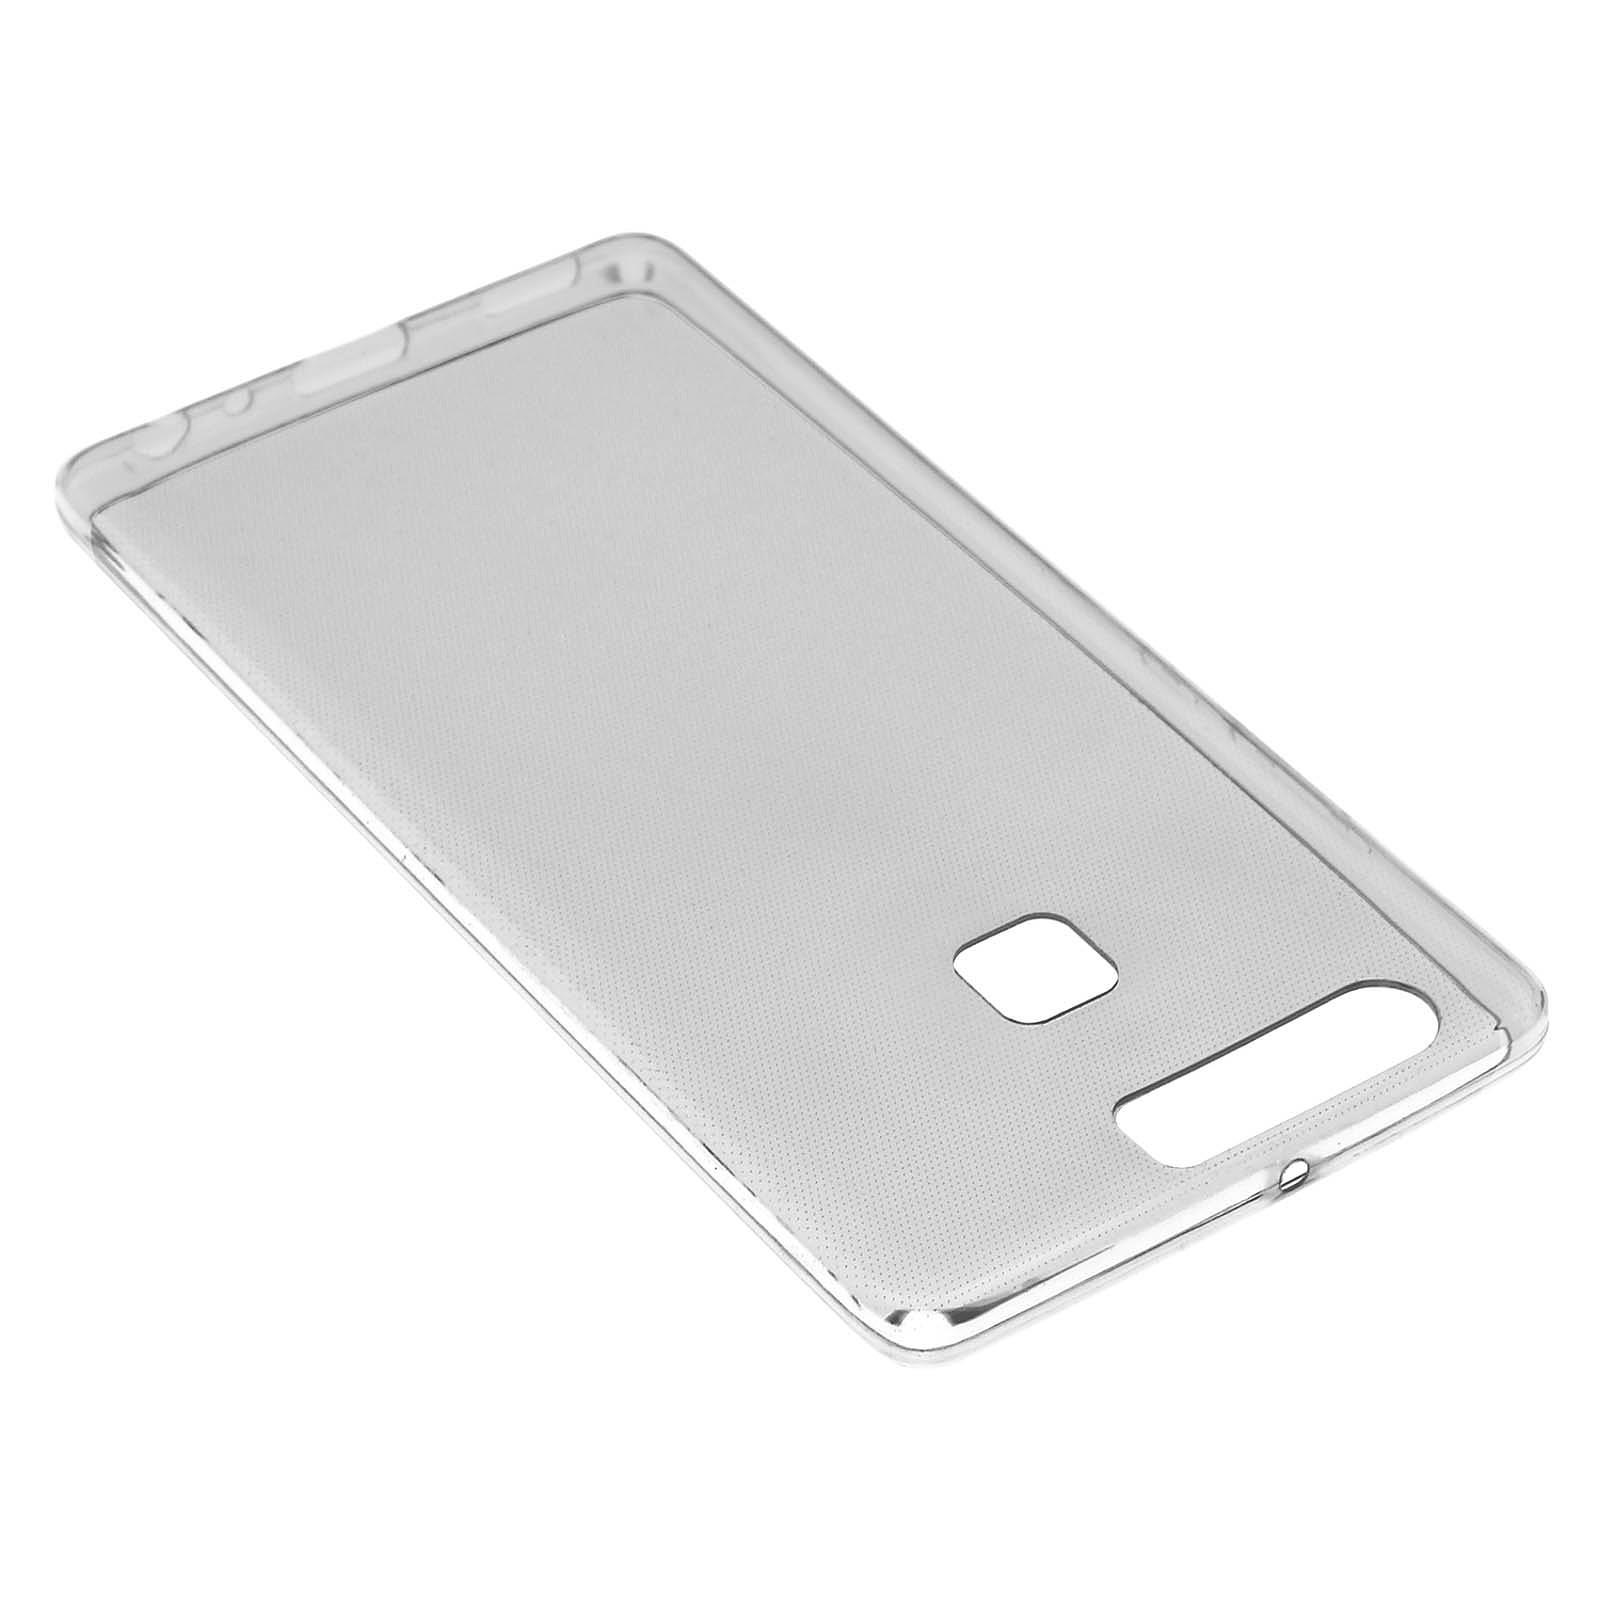 Avizar Pack protection Transparent pour Huawei P9